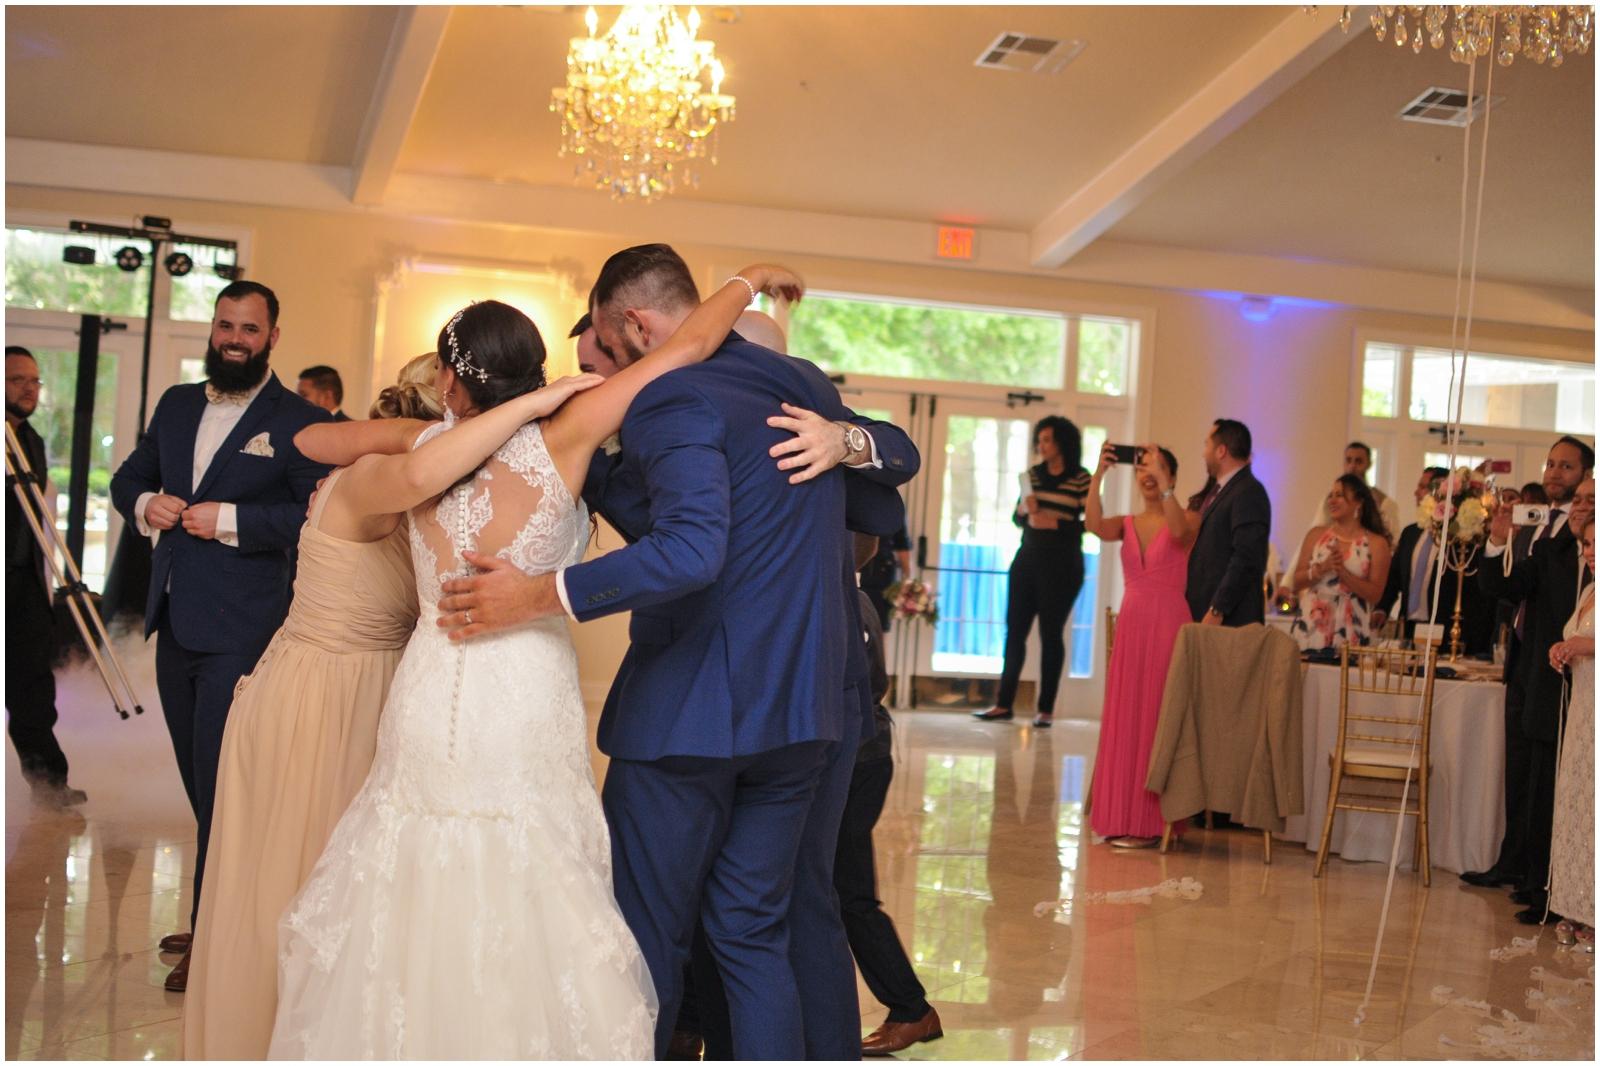 Rustic-Elegant-Wedding-Venue-in-Tampa-Stonebridge-Events_0446.jpg